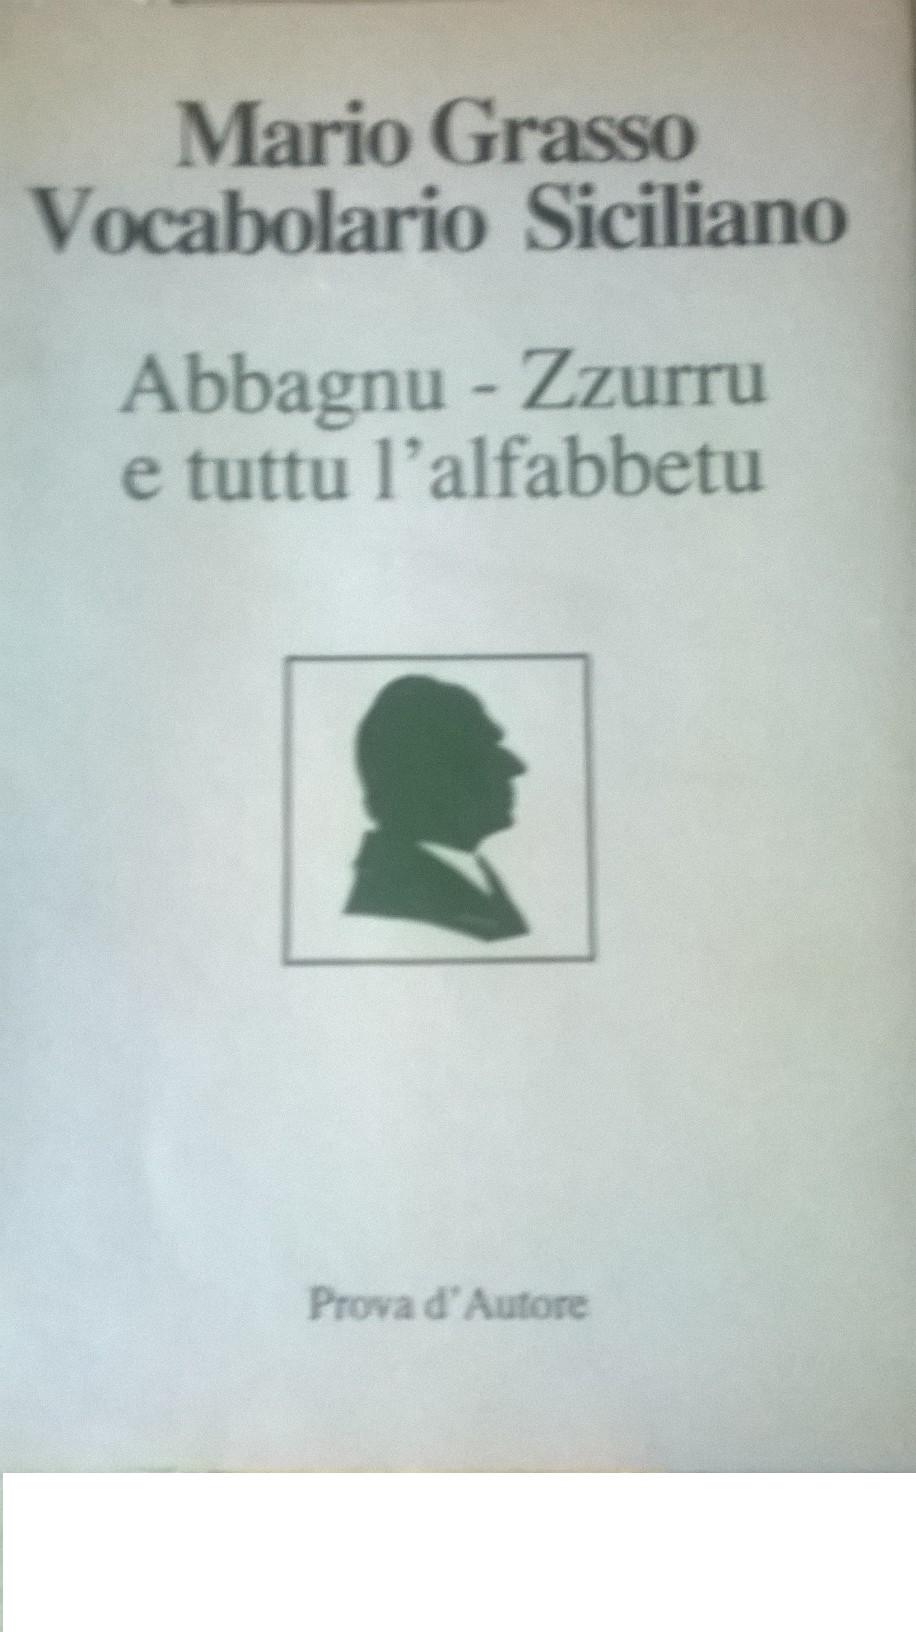 Vocabolario siciliano